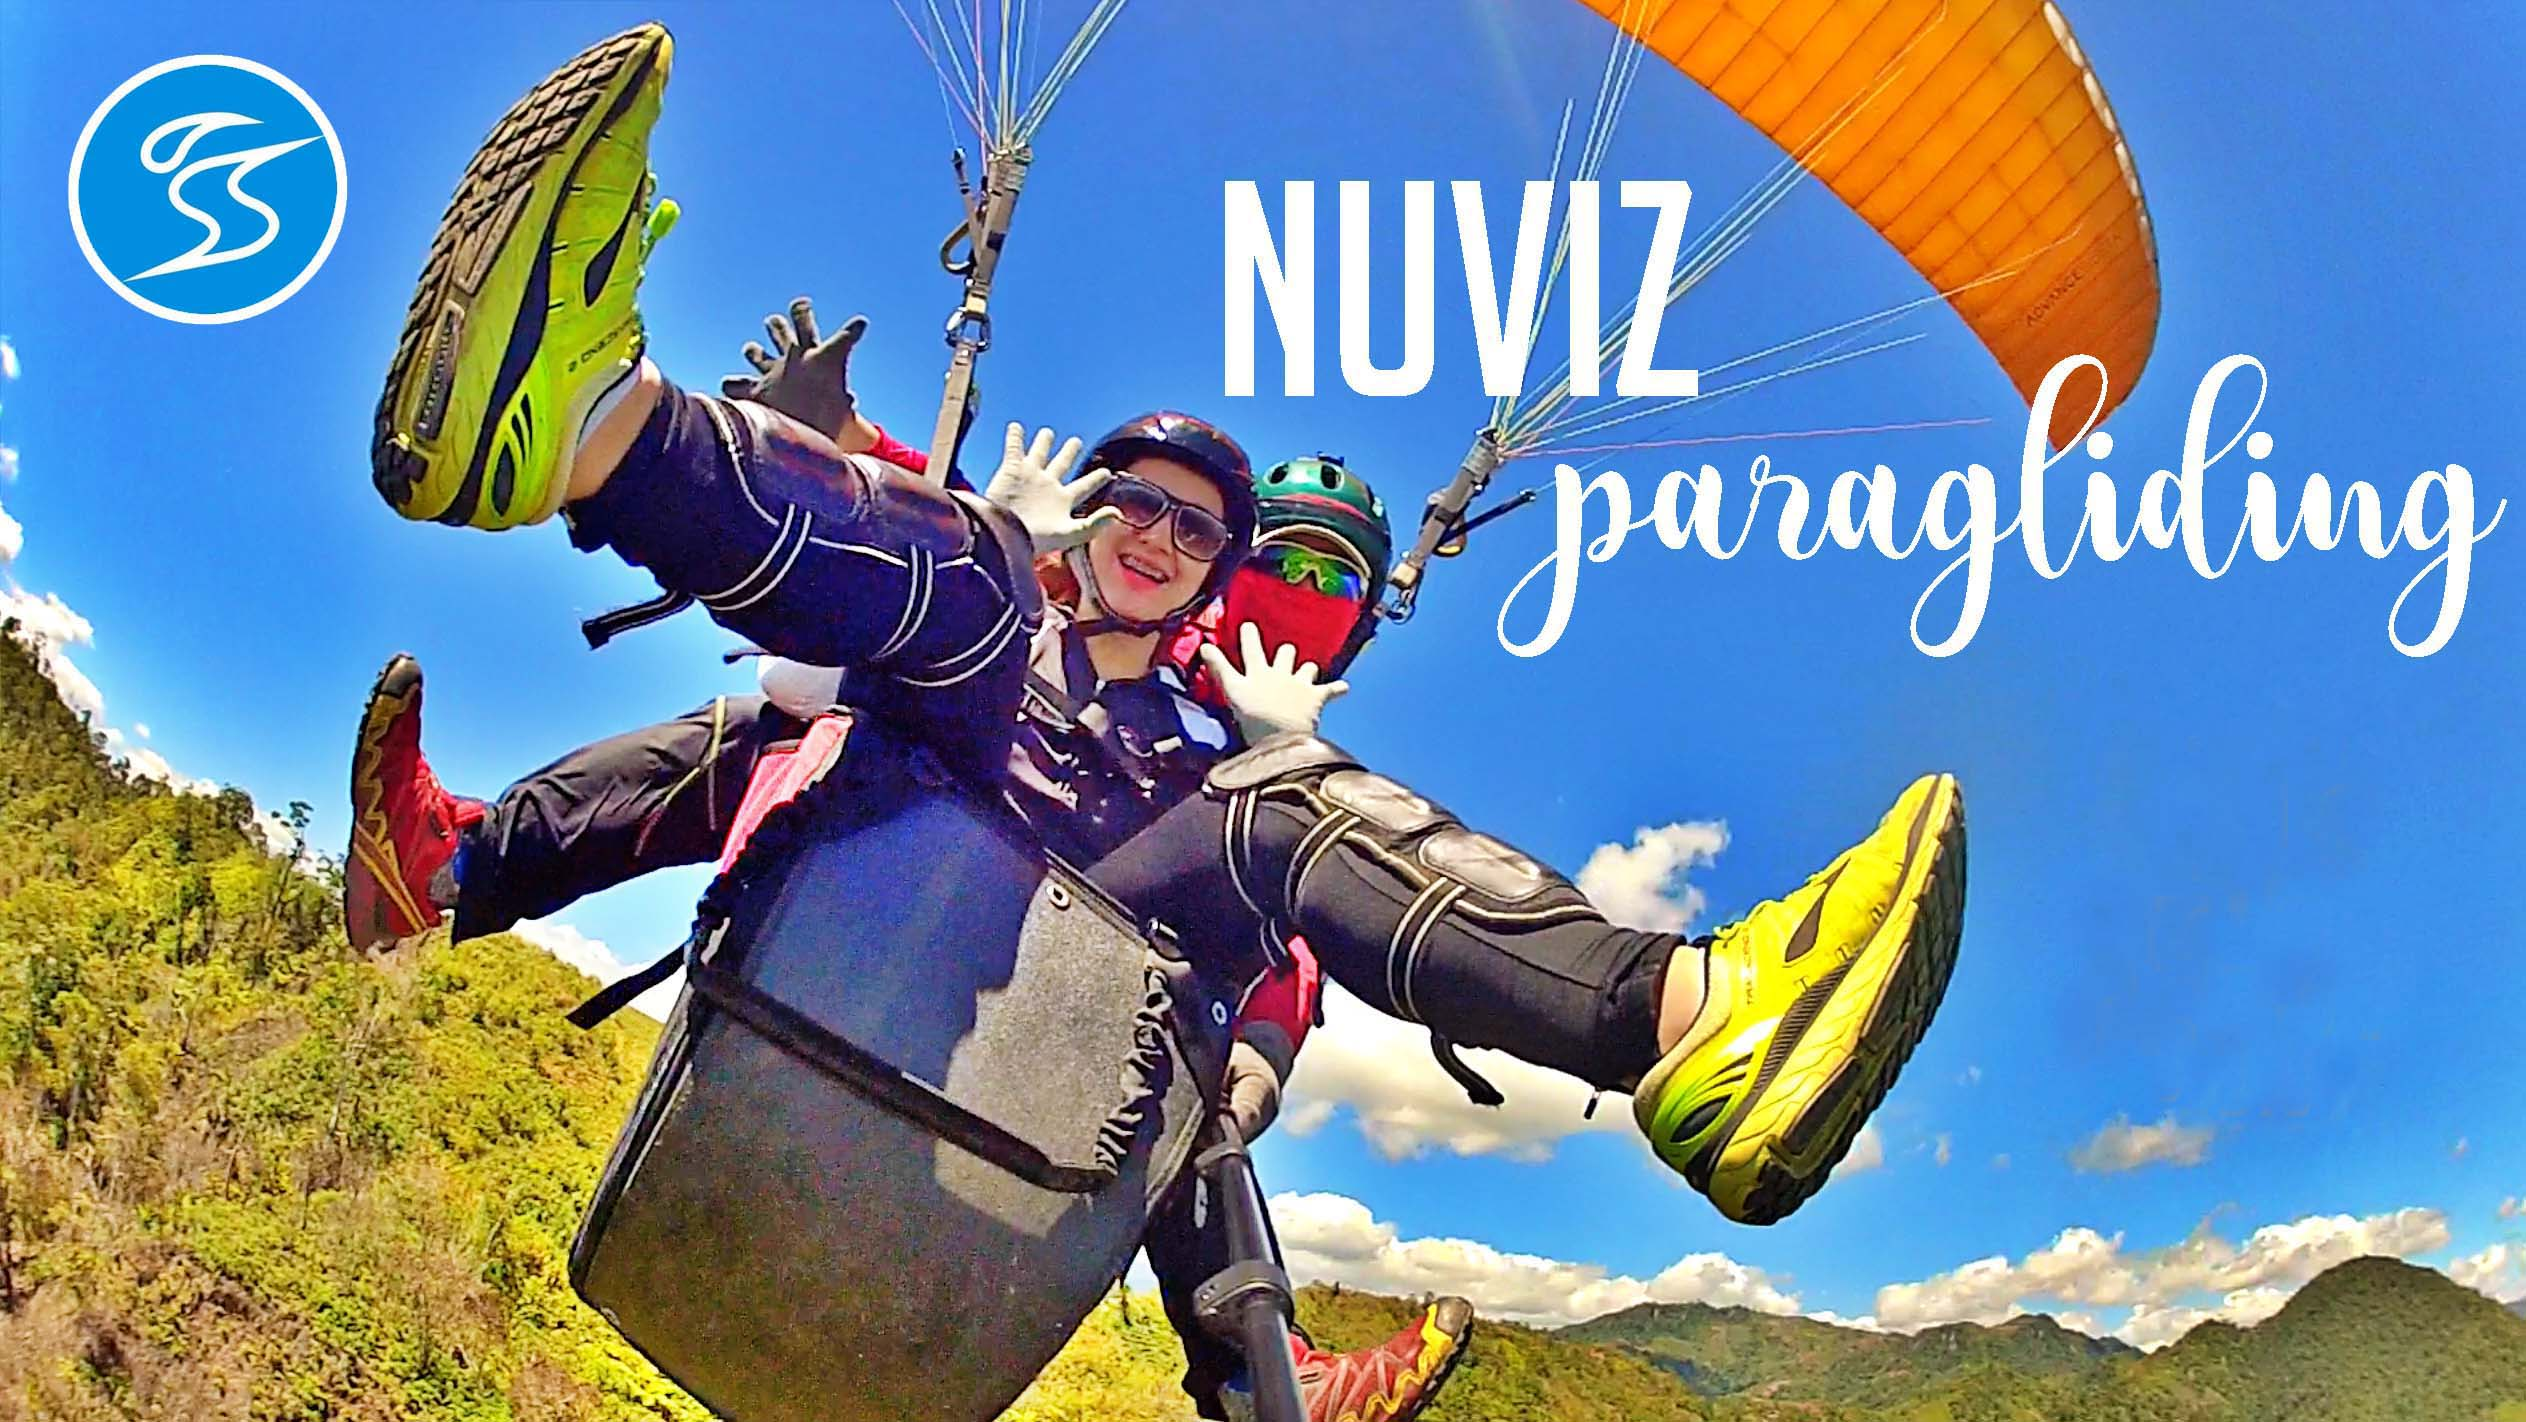 nuviz-paragliding-may15-31.jpg